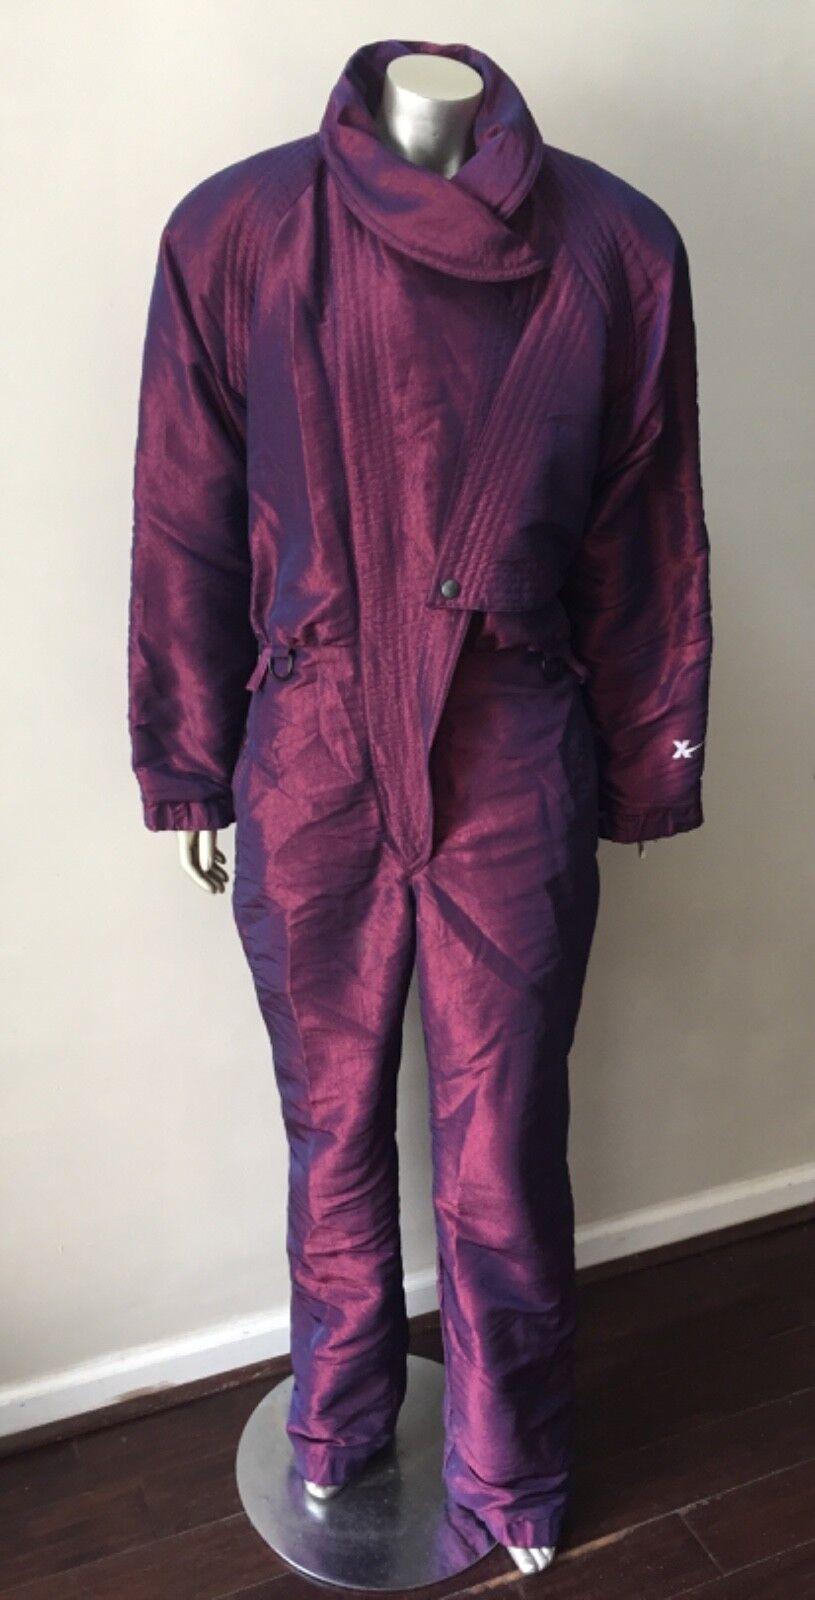 Metallic Retro Vintage 90s Ski Snow Suit Coat  Insulated Jumpsuit Purple L  the lowest price